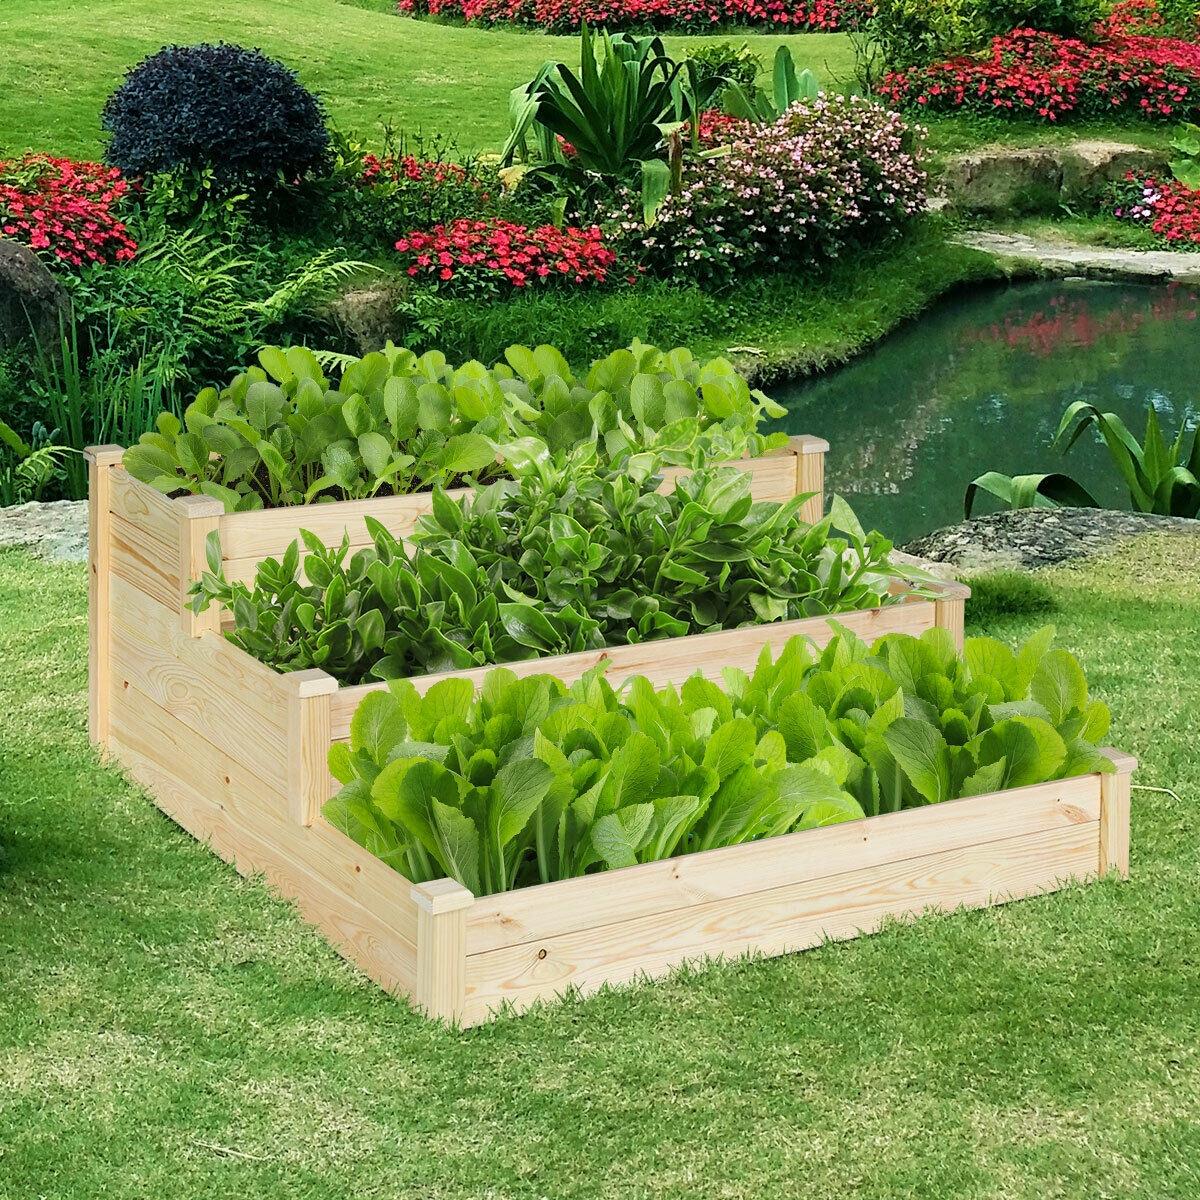 3 Tier Wooden Raised Garden Flower Vegetables Bed